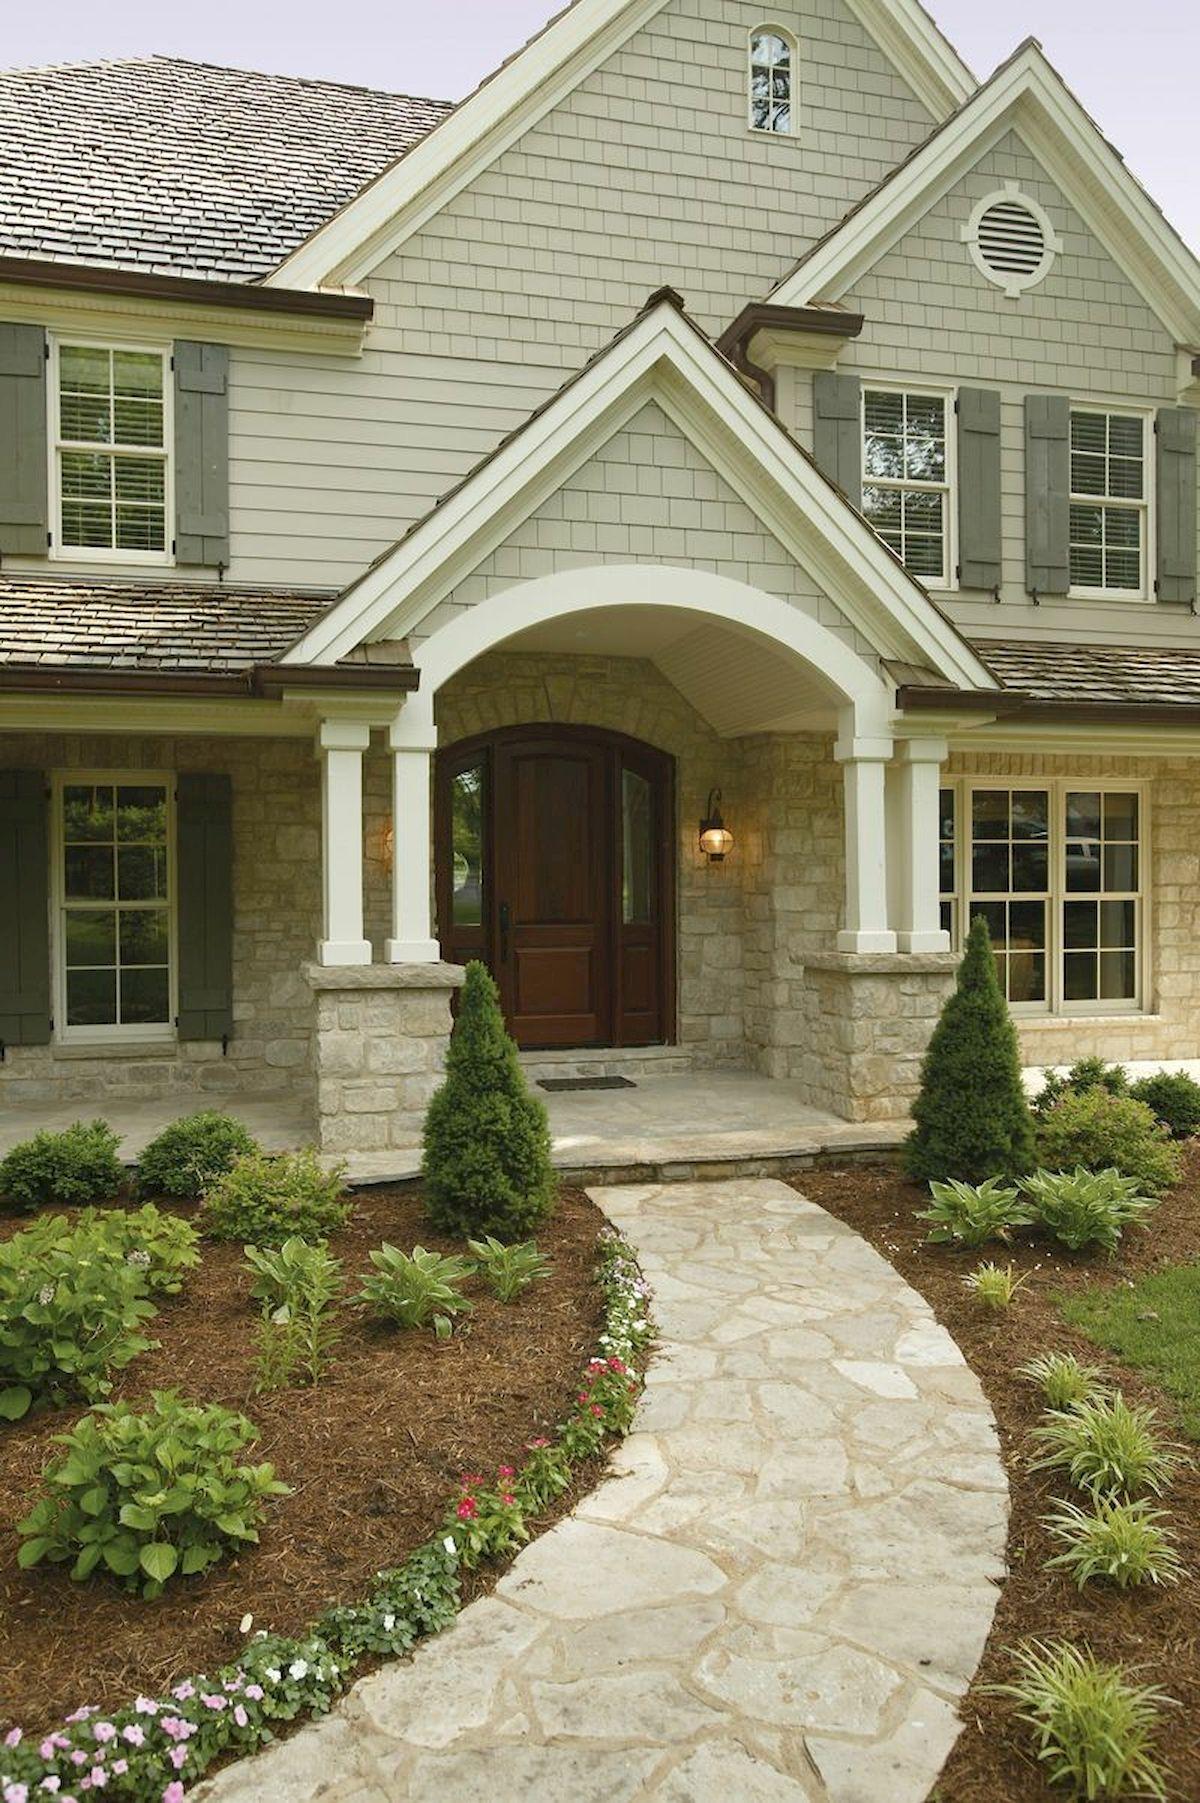 70 Stunning Exterior House Design Ideas (37)